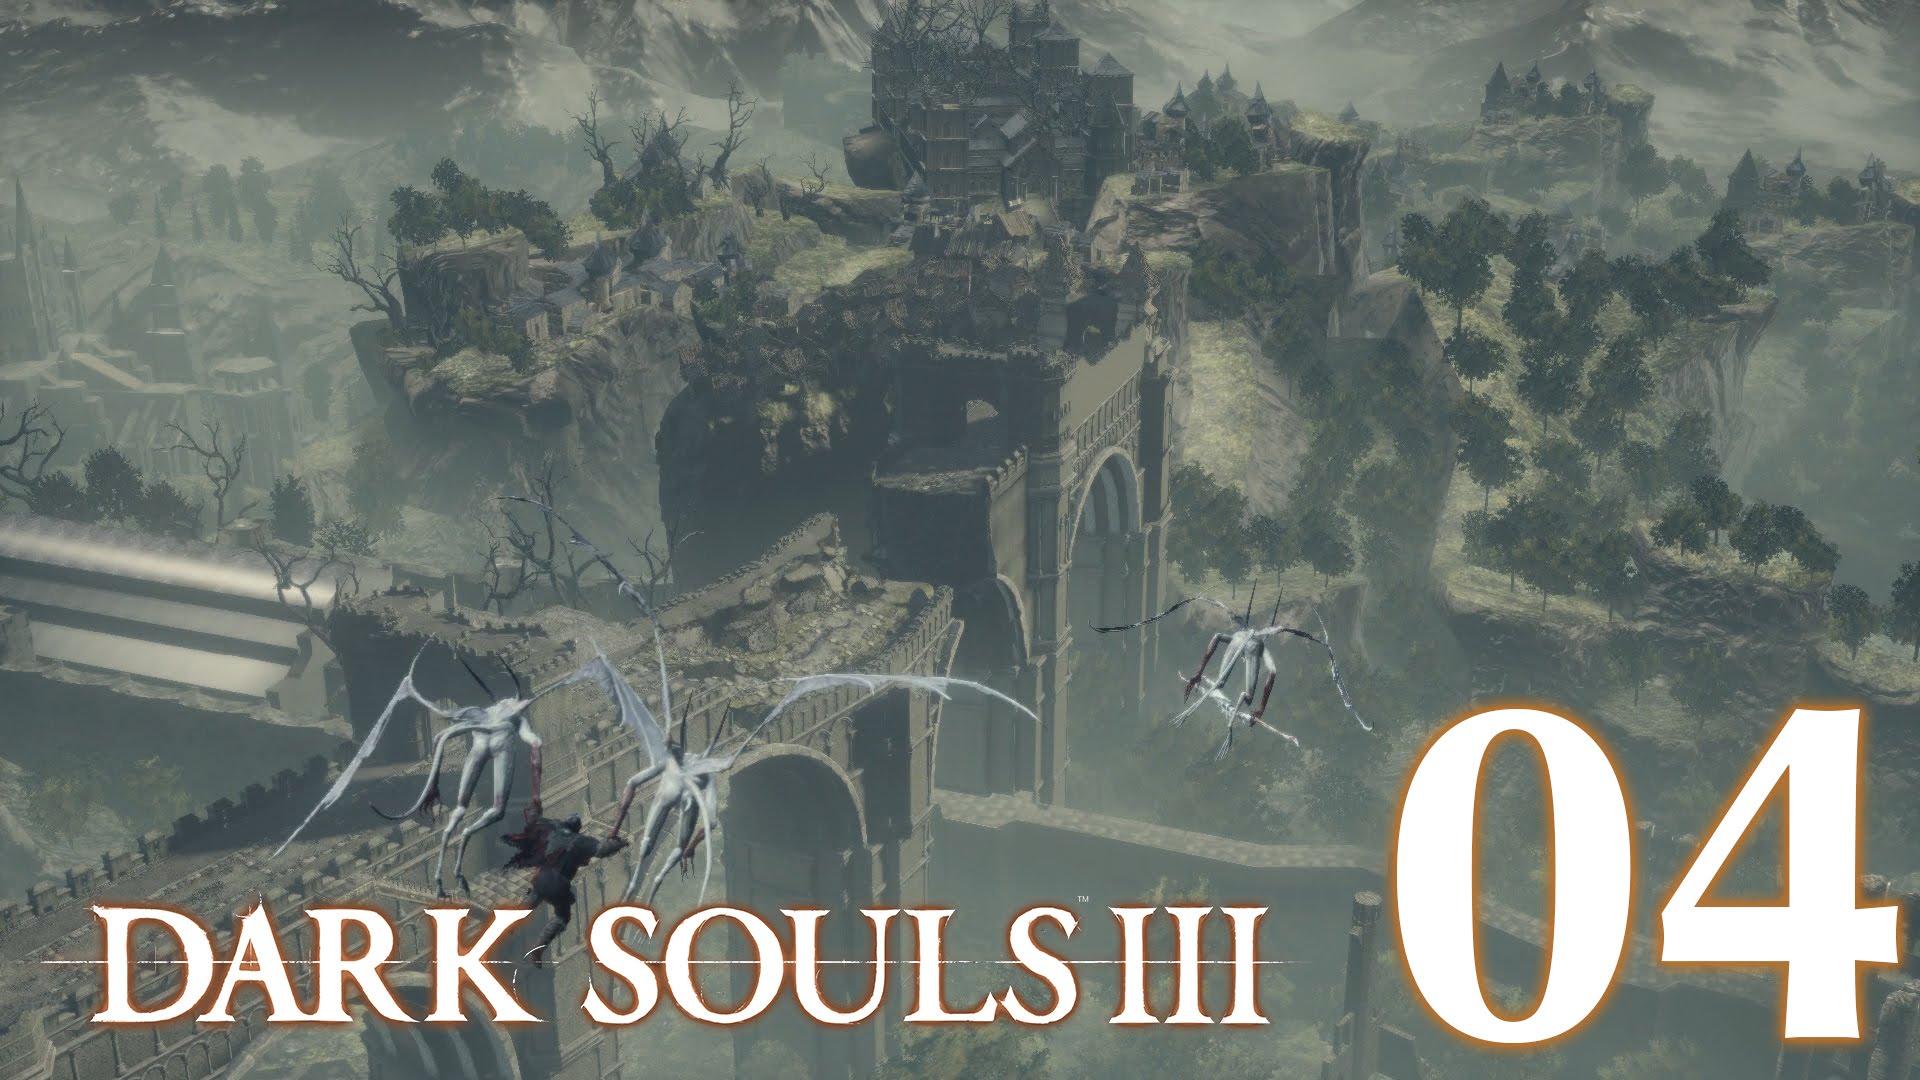 #04 【PS4版】 DARK SOULS Ⅲ (ダークソウル 3) 【ロスリックの高壁 #02】